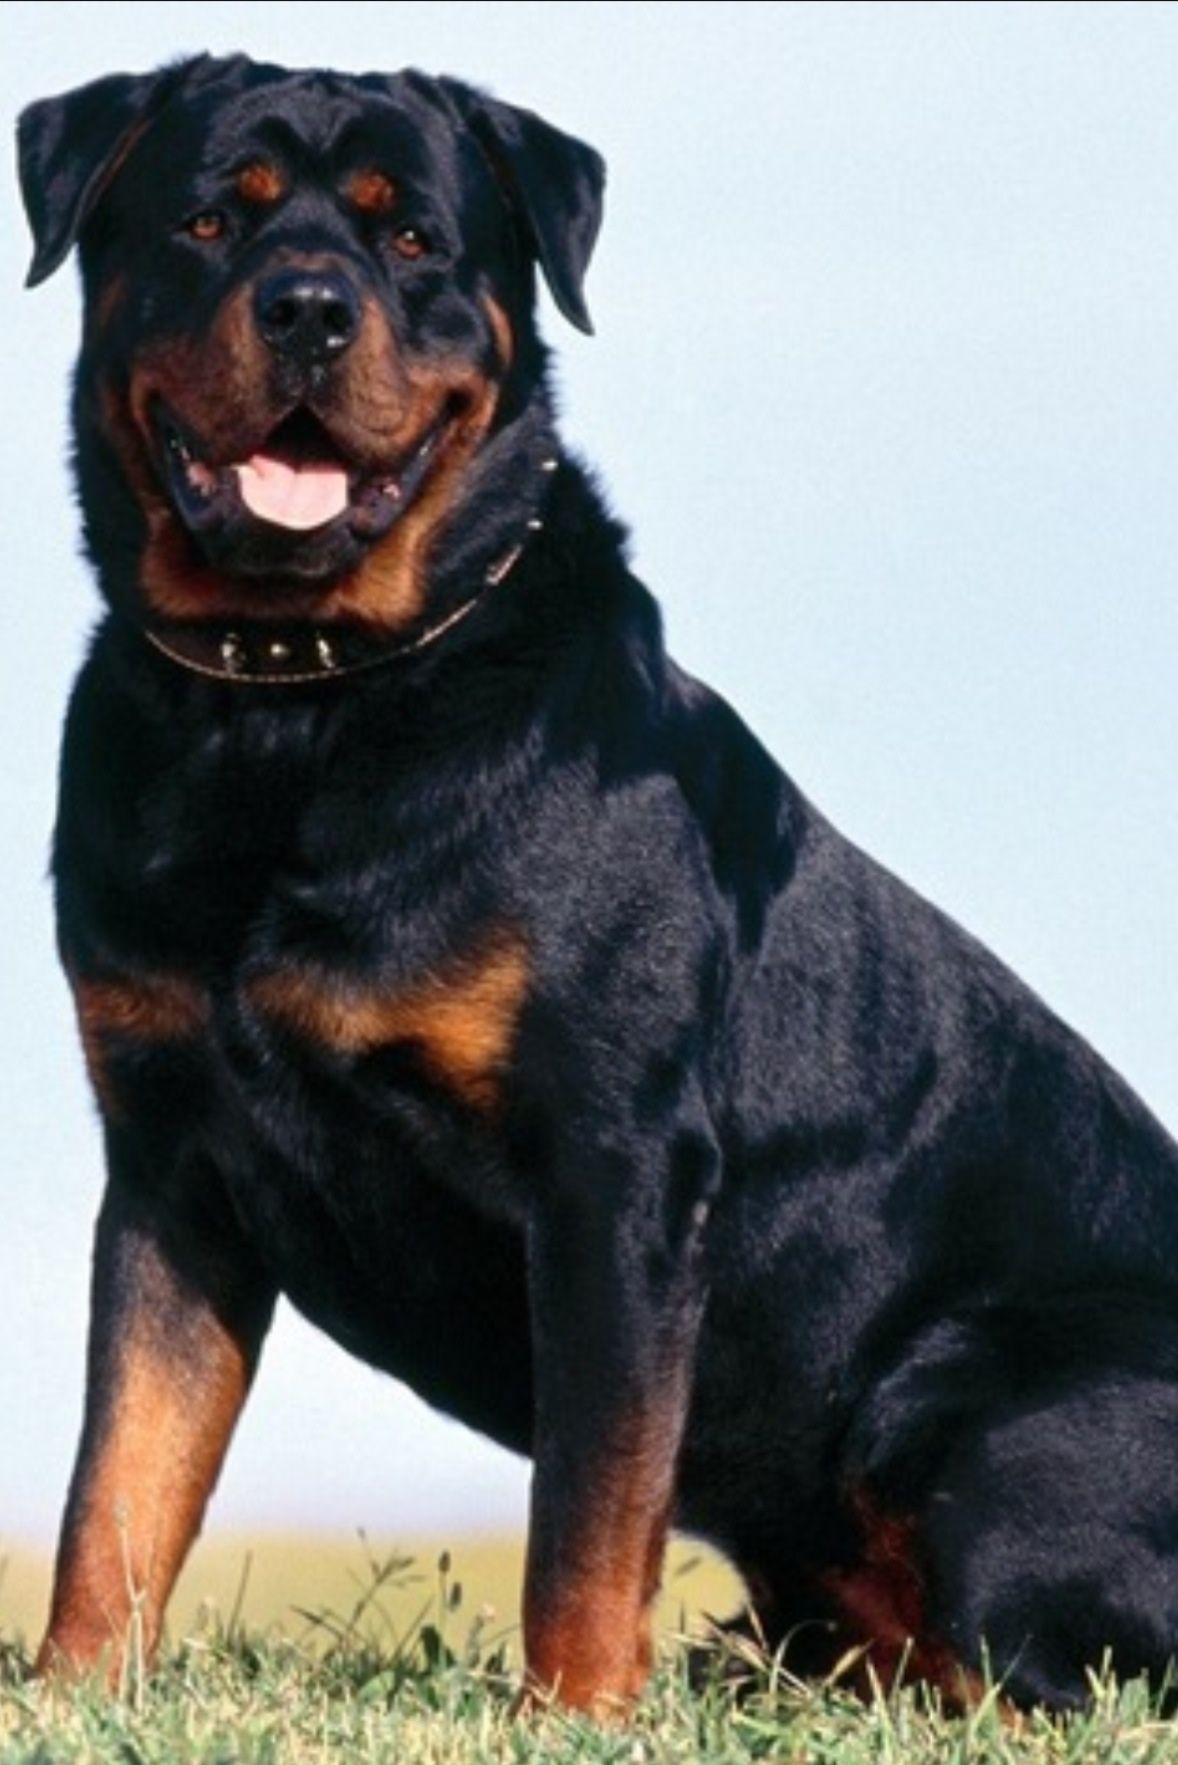 Rottweiler Rottweiler Dog Rottweiler Dog Breed Dog Breeds